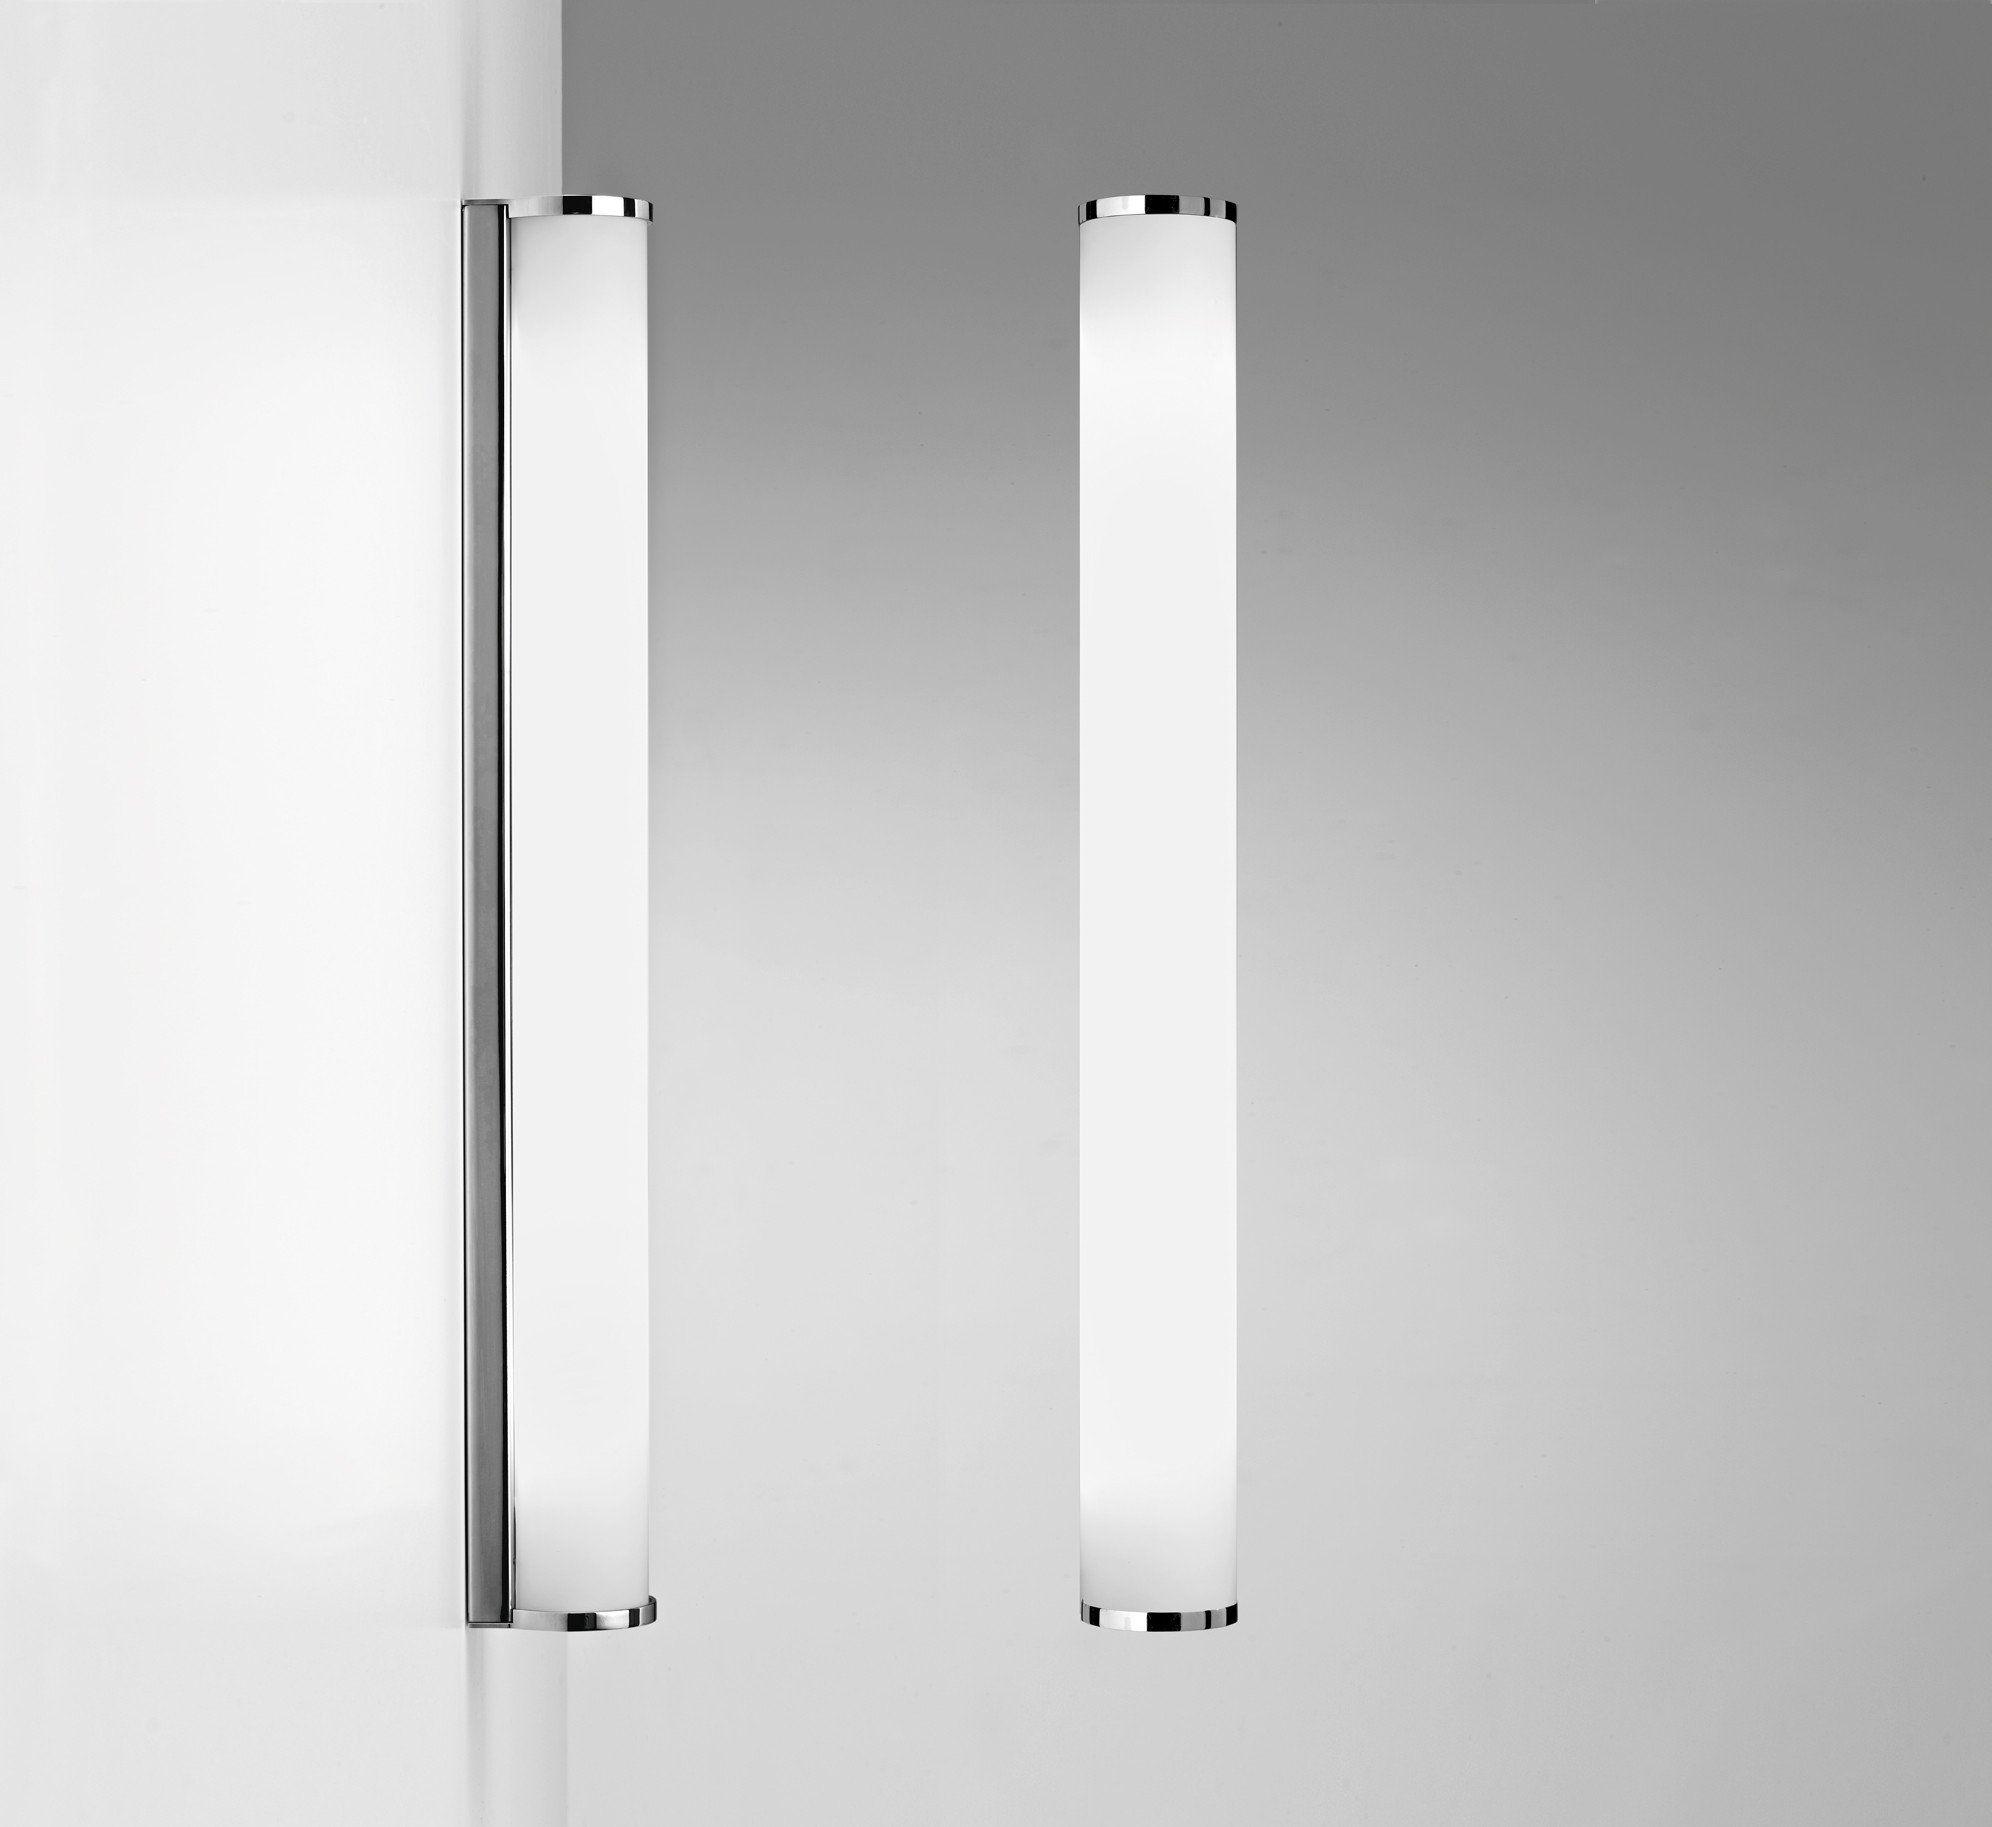 Omega Wall Or Ceiling Light Ceiling Lights Modern Sconces Bathroom Light Fixtures